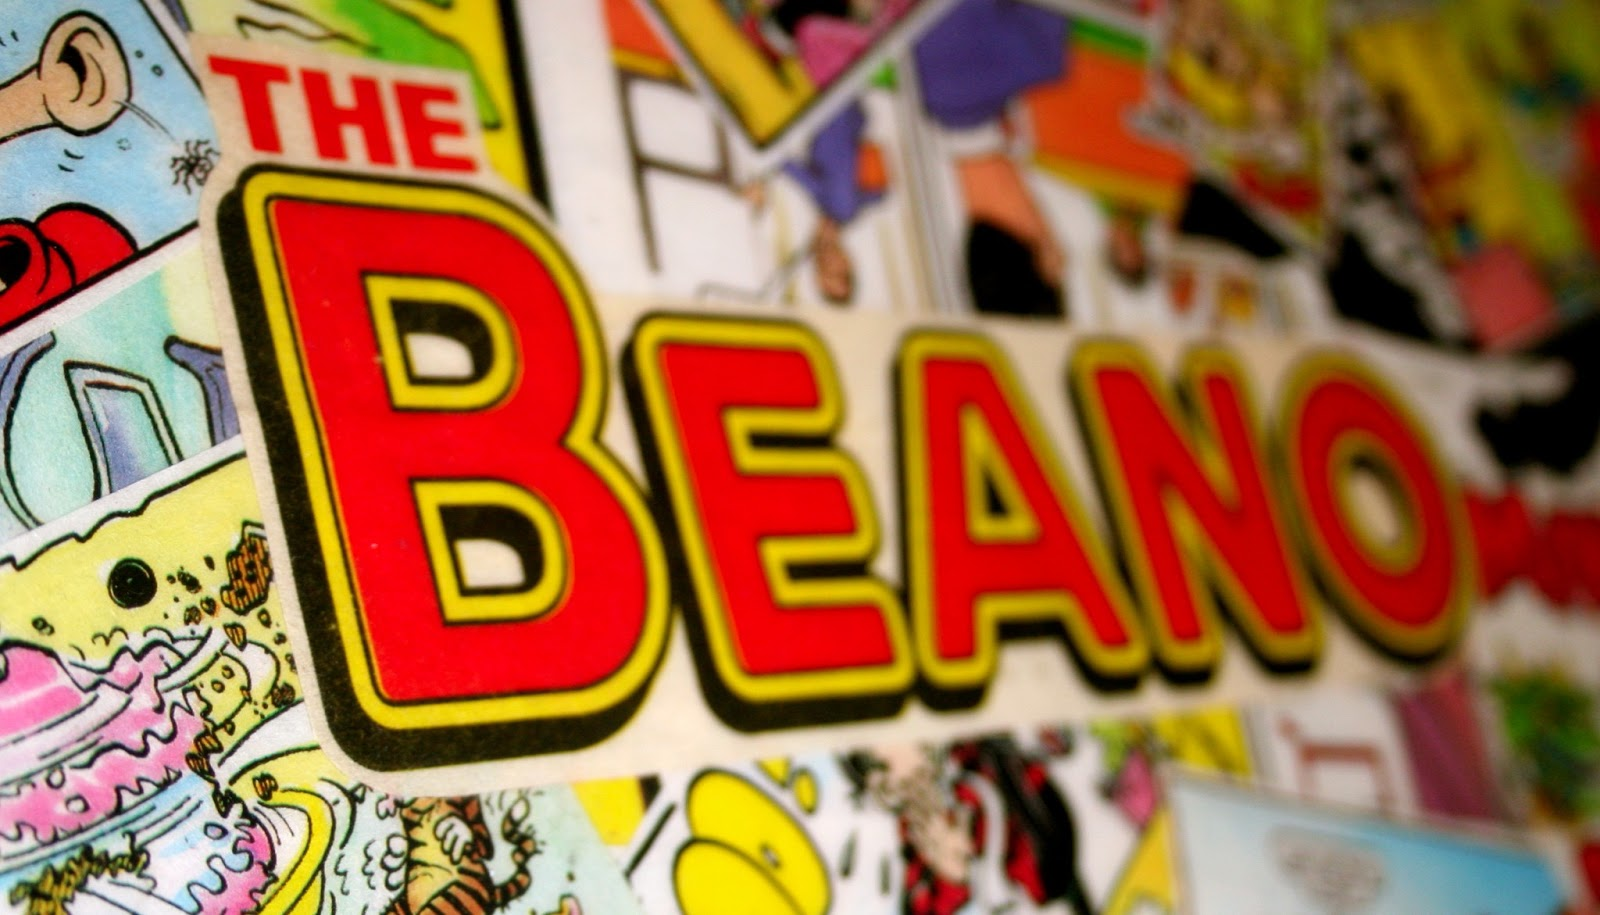 Best 40 Beano Wallpaper on HipWallpaper Beano Wallpaper 1600x915